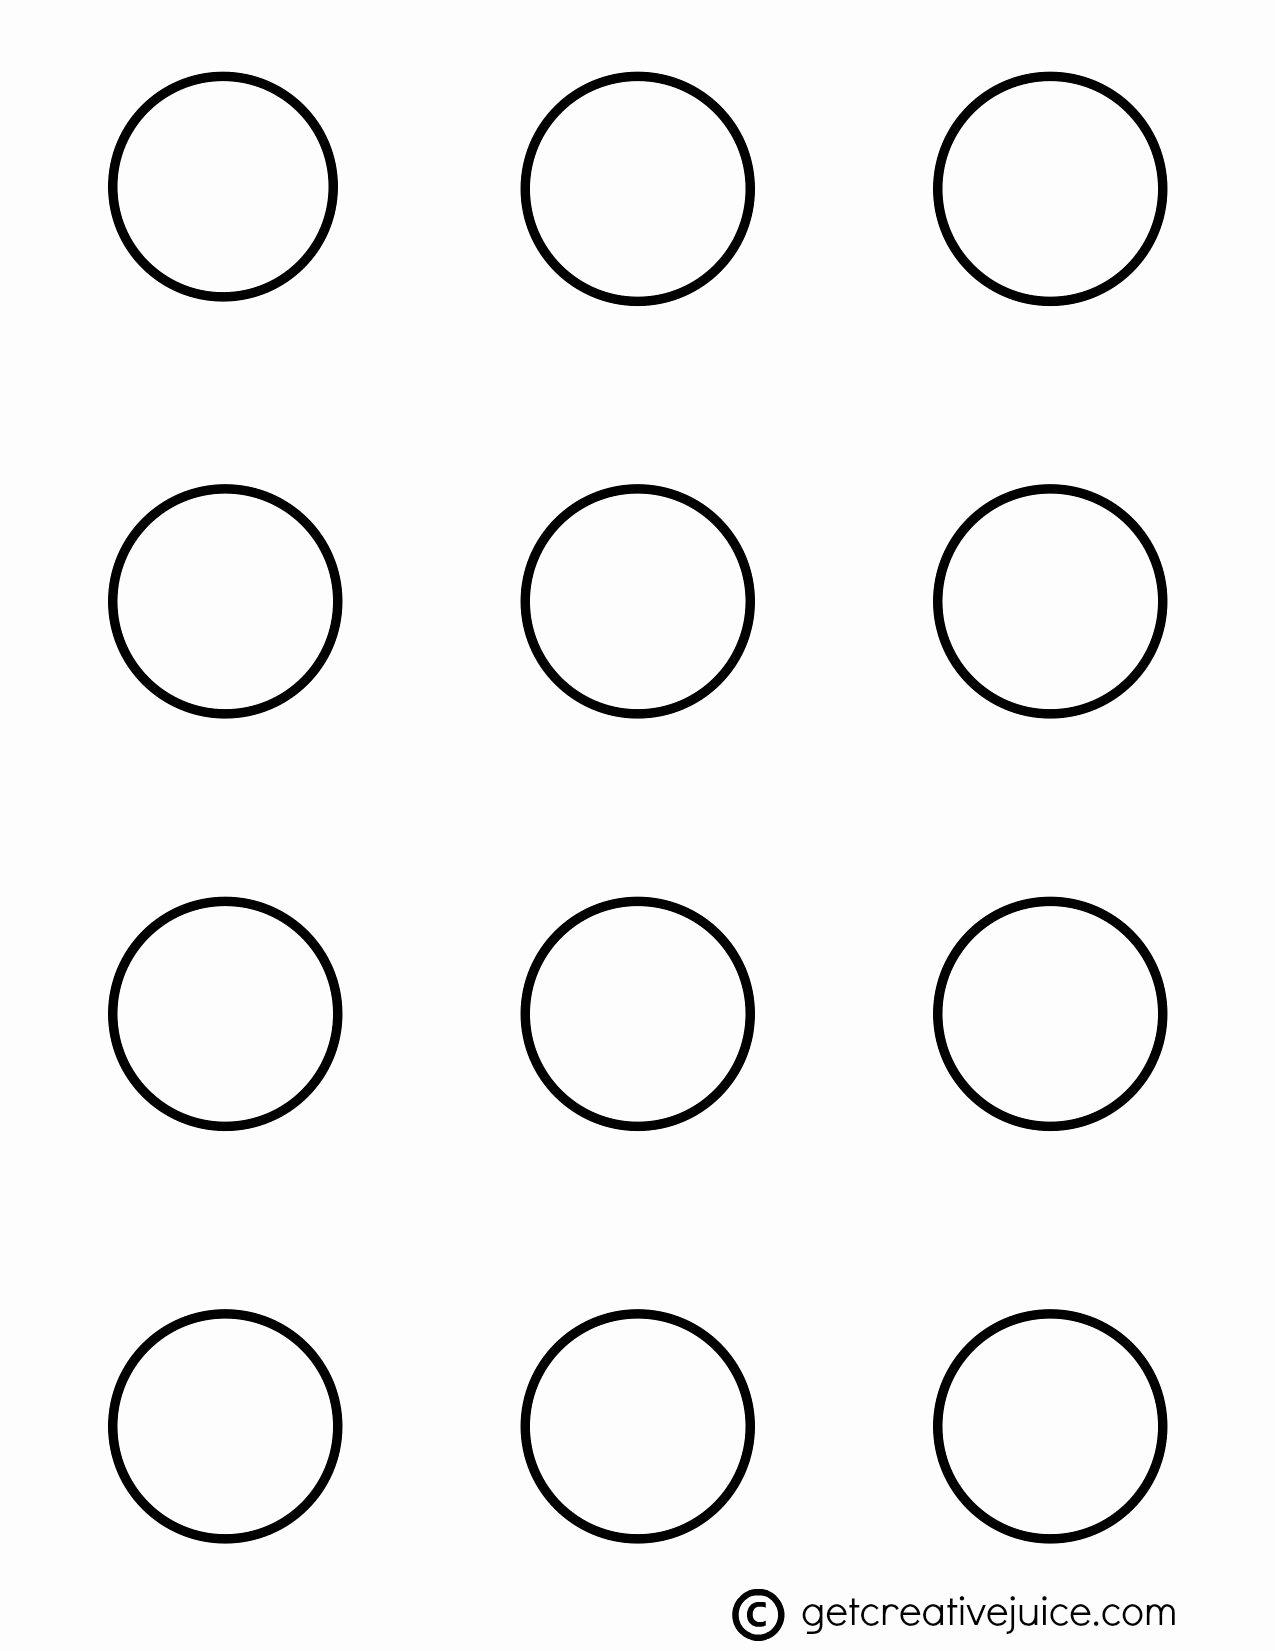 Macaron Printable Template Elegant Circle 1 5 Inch Macaron Template